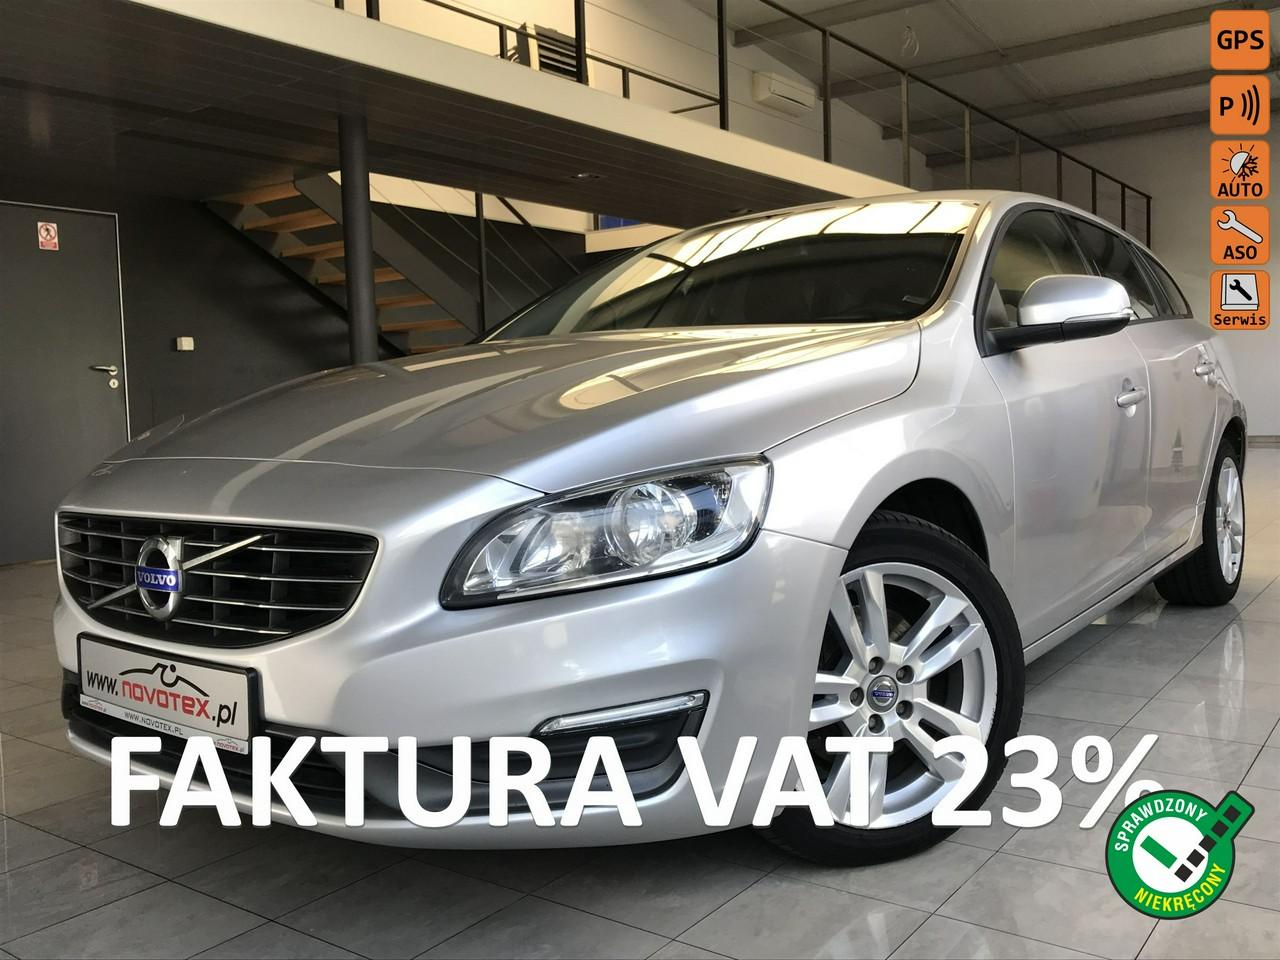 Volvo V60 D2*Momentum*navi*ALU17*serwis w ASO Volvo*Gwarancja VIP Service